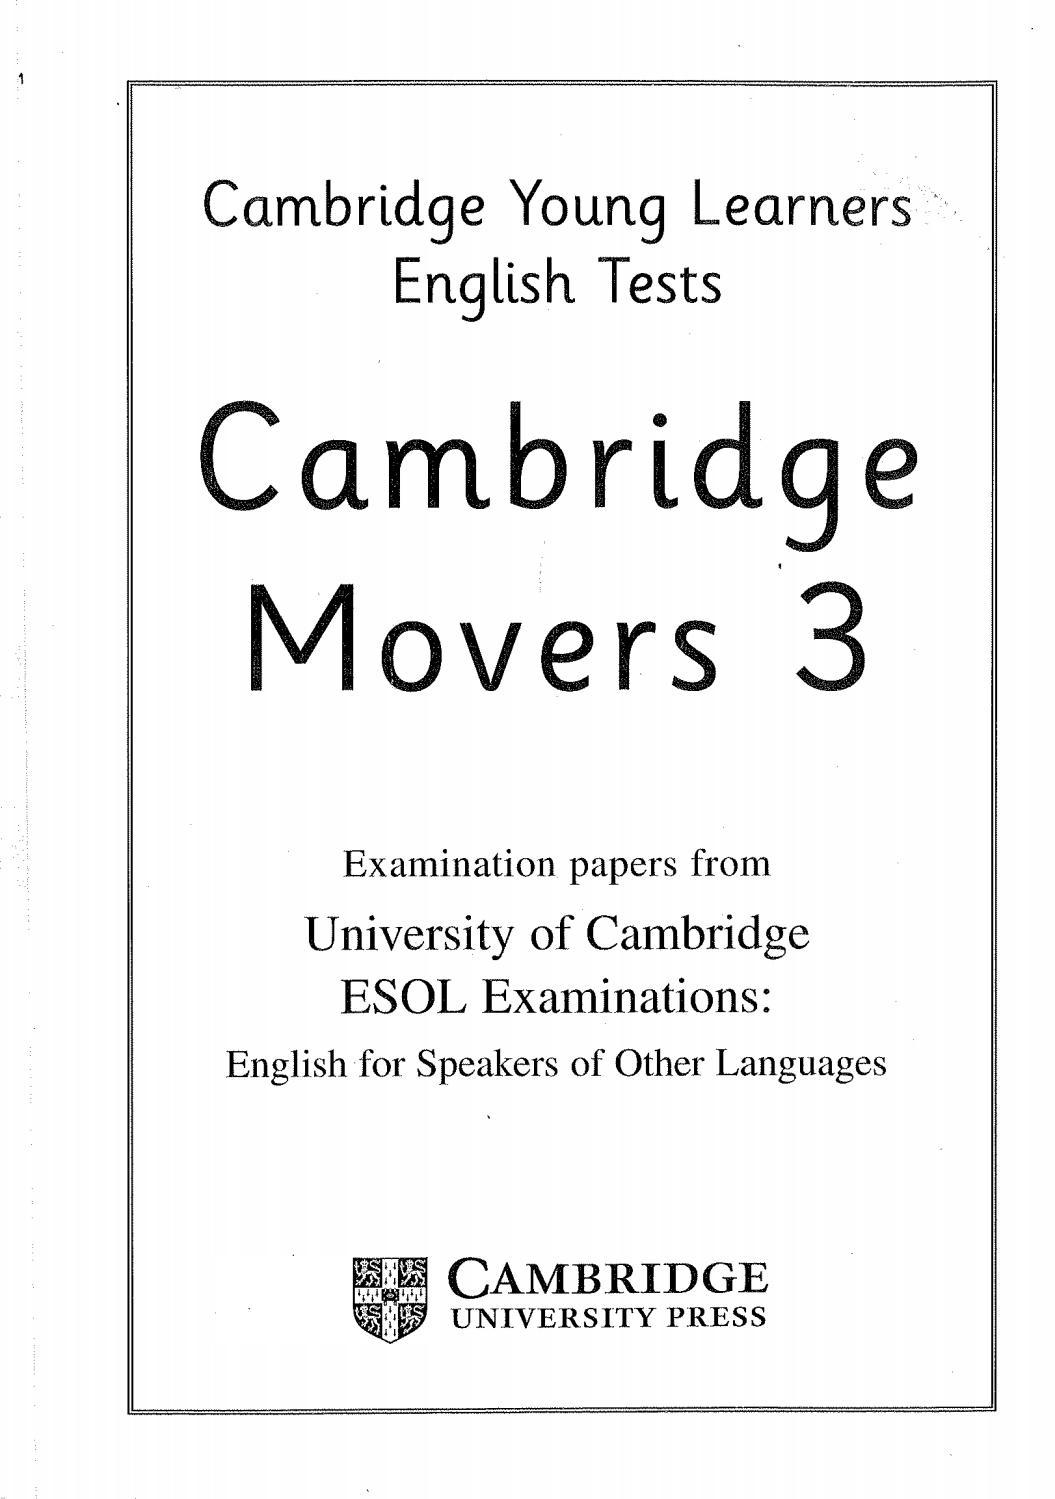 Cambridge mover 3 student's book 28 9 2017 by EBOOK SOS LIB